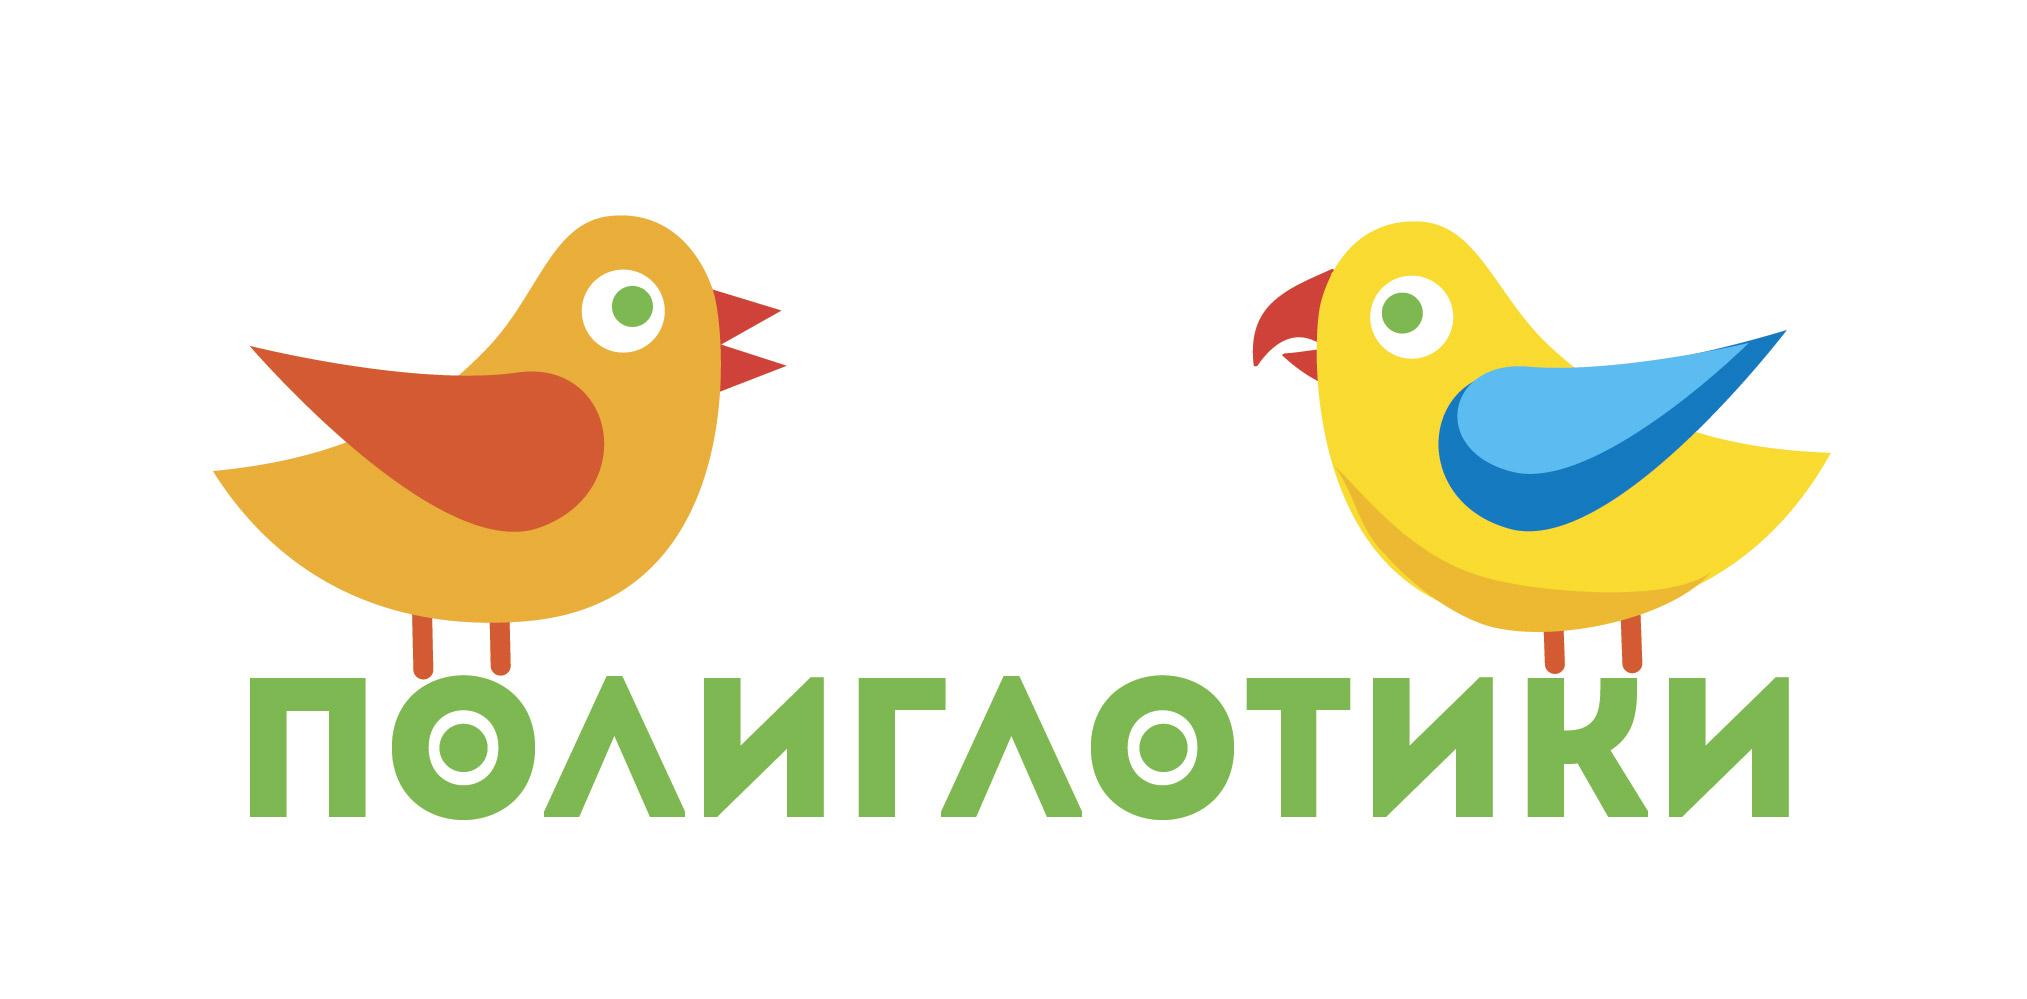 http://unicred.ru/wp-content/uploads/2018/06/Zai-my-s-18-let-onlai-n-na-kartu-bez-proverok-srochno-spisok-samye-novye-zai-my.jpg